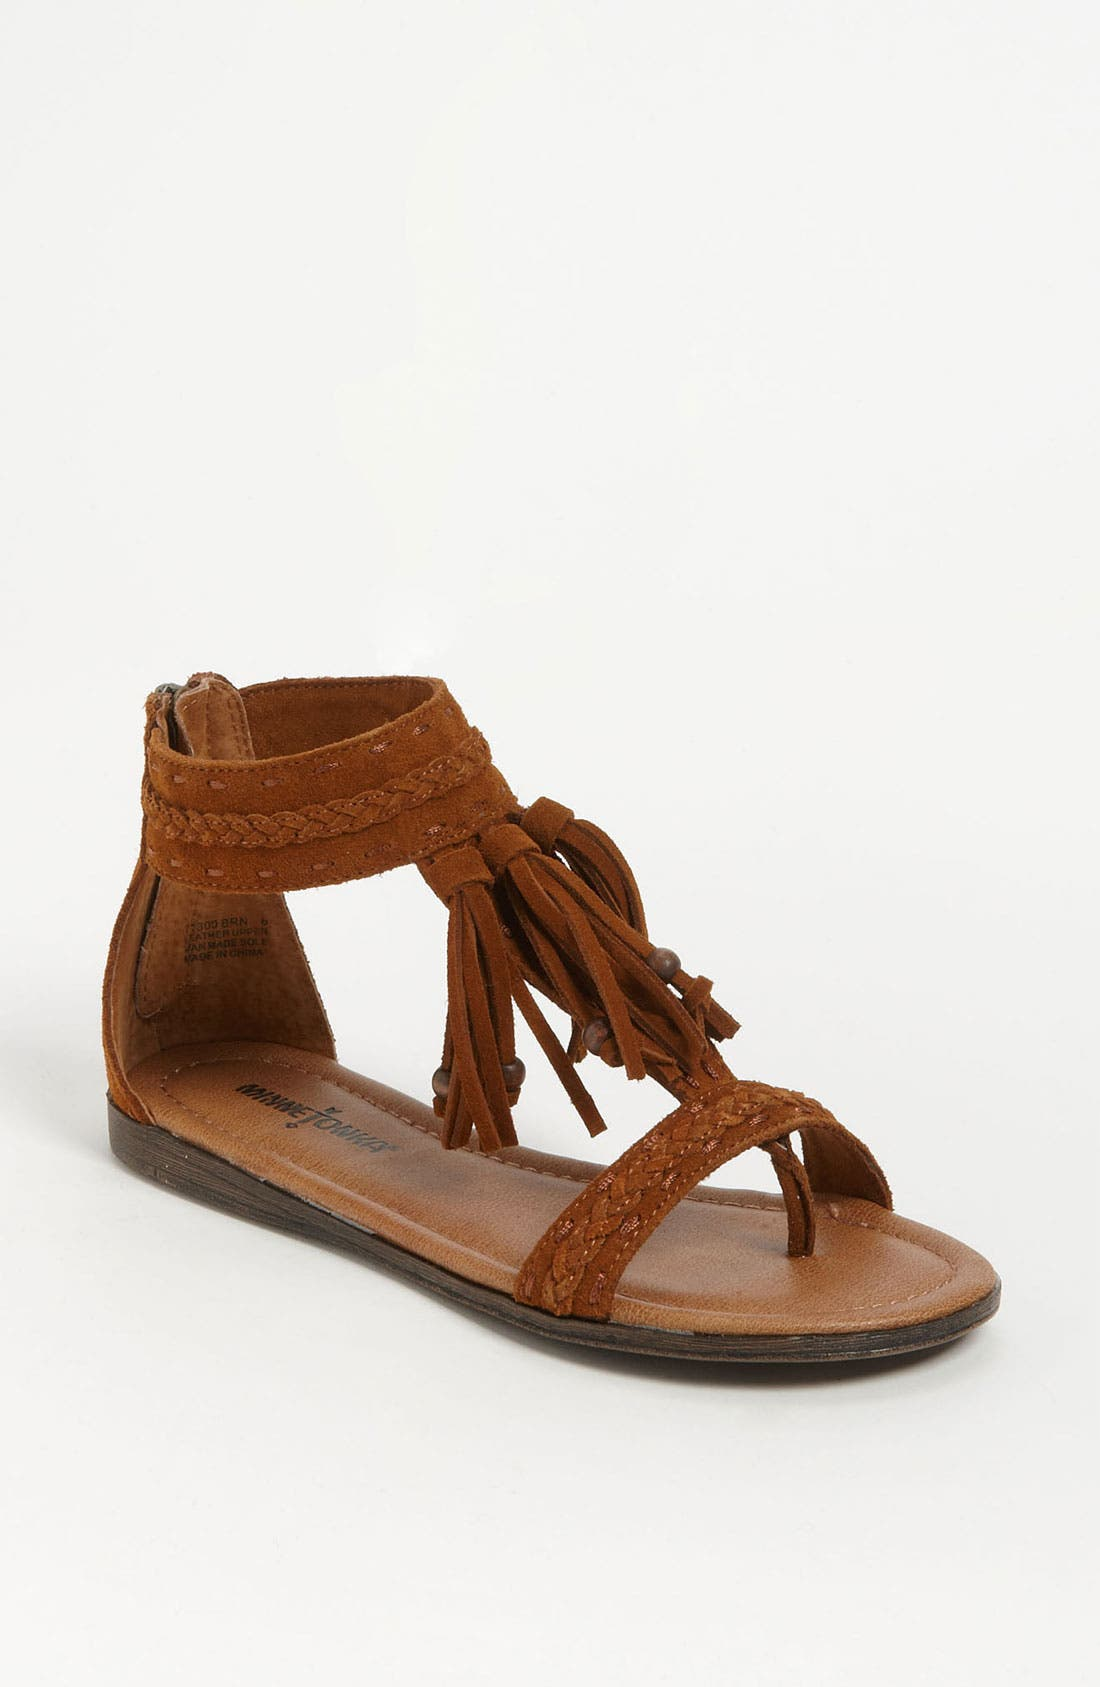 Alternate Image 1 Selected - Minnetonka 'Belize' Sandal